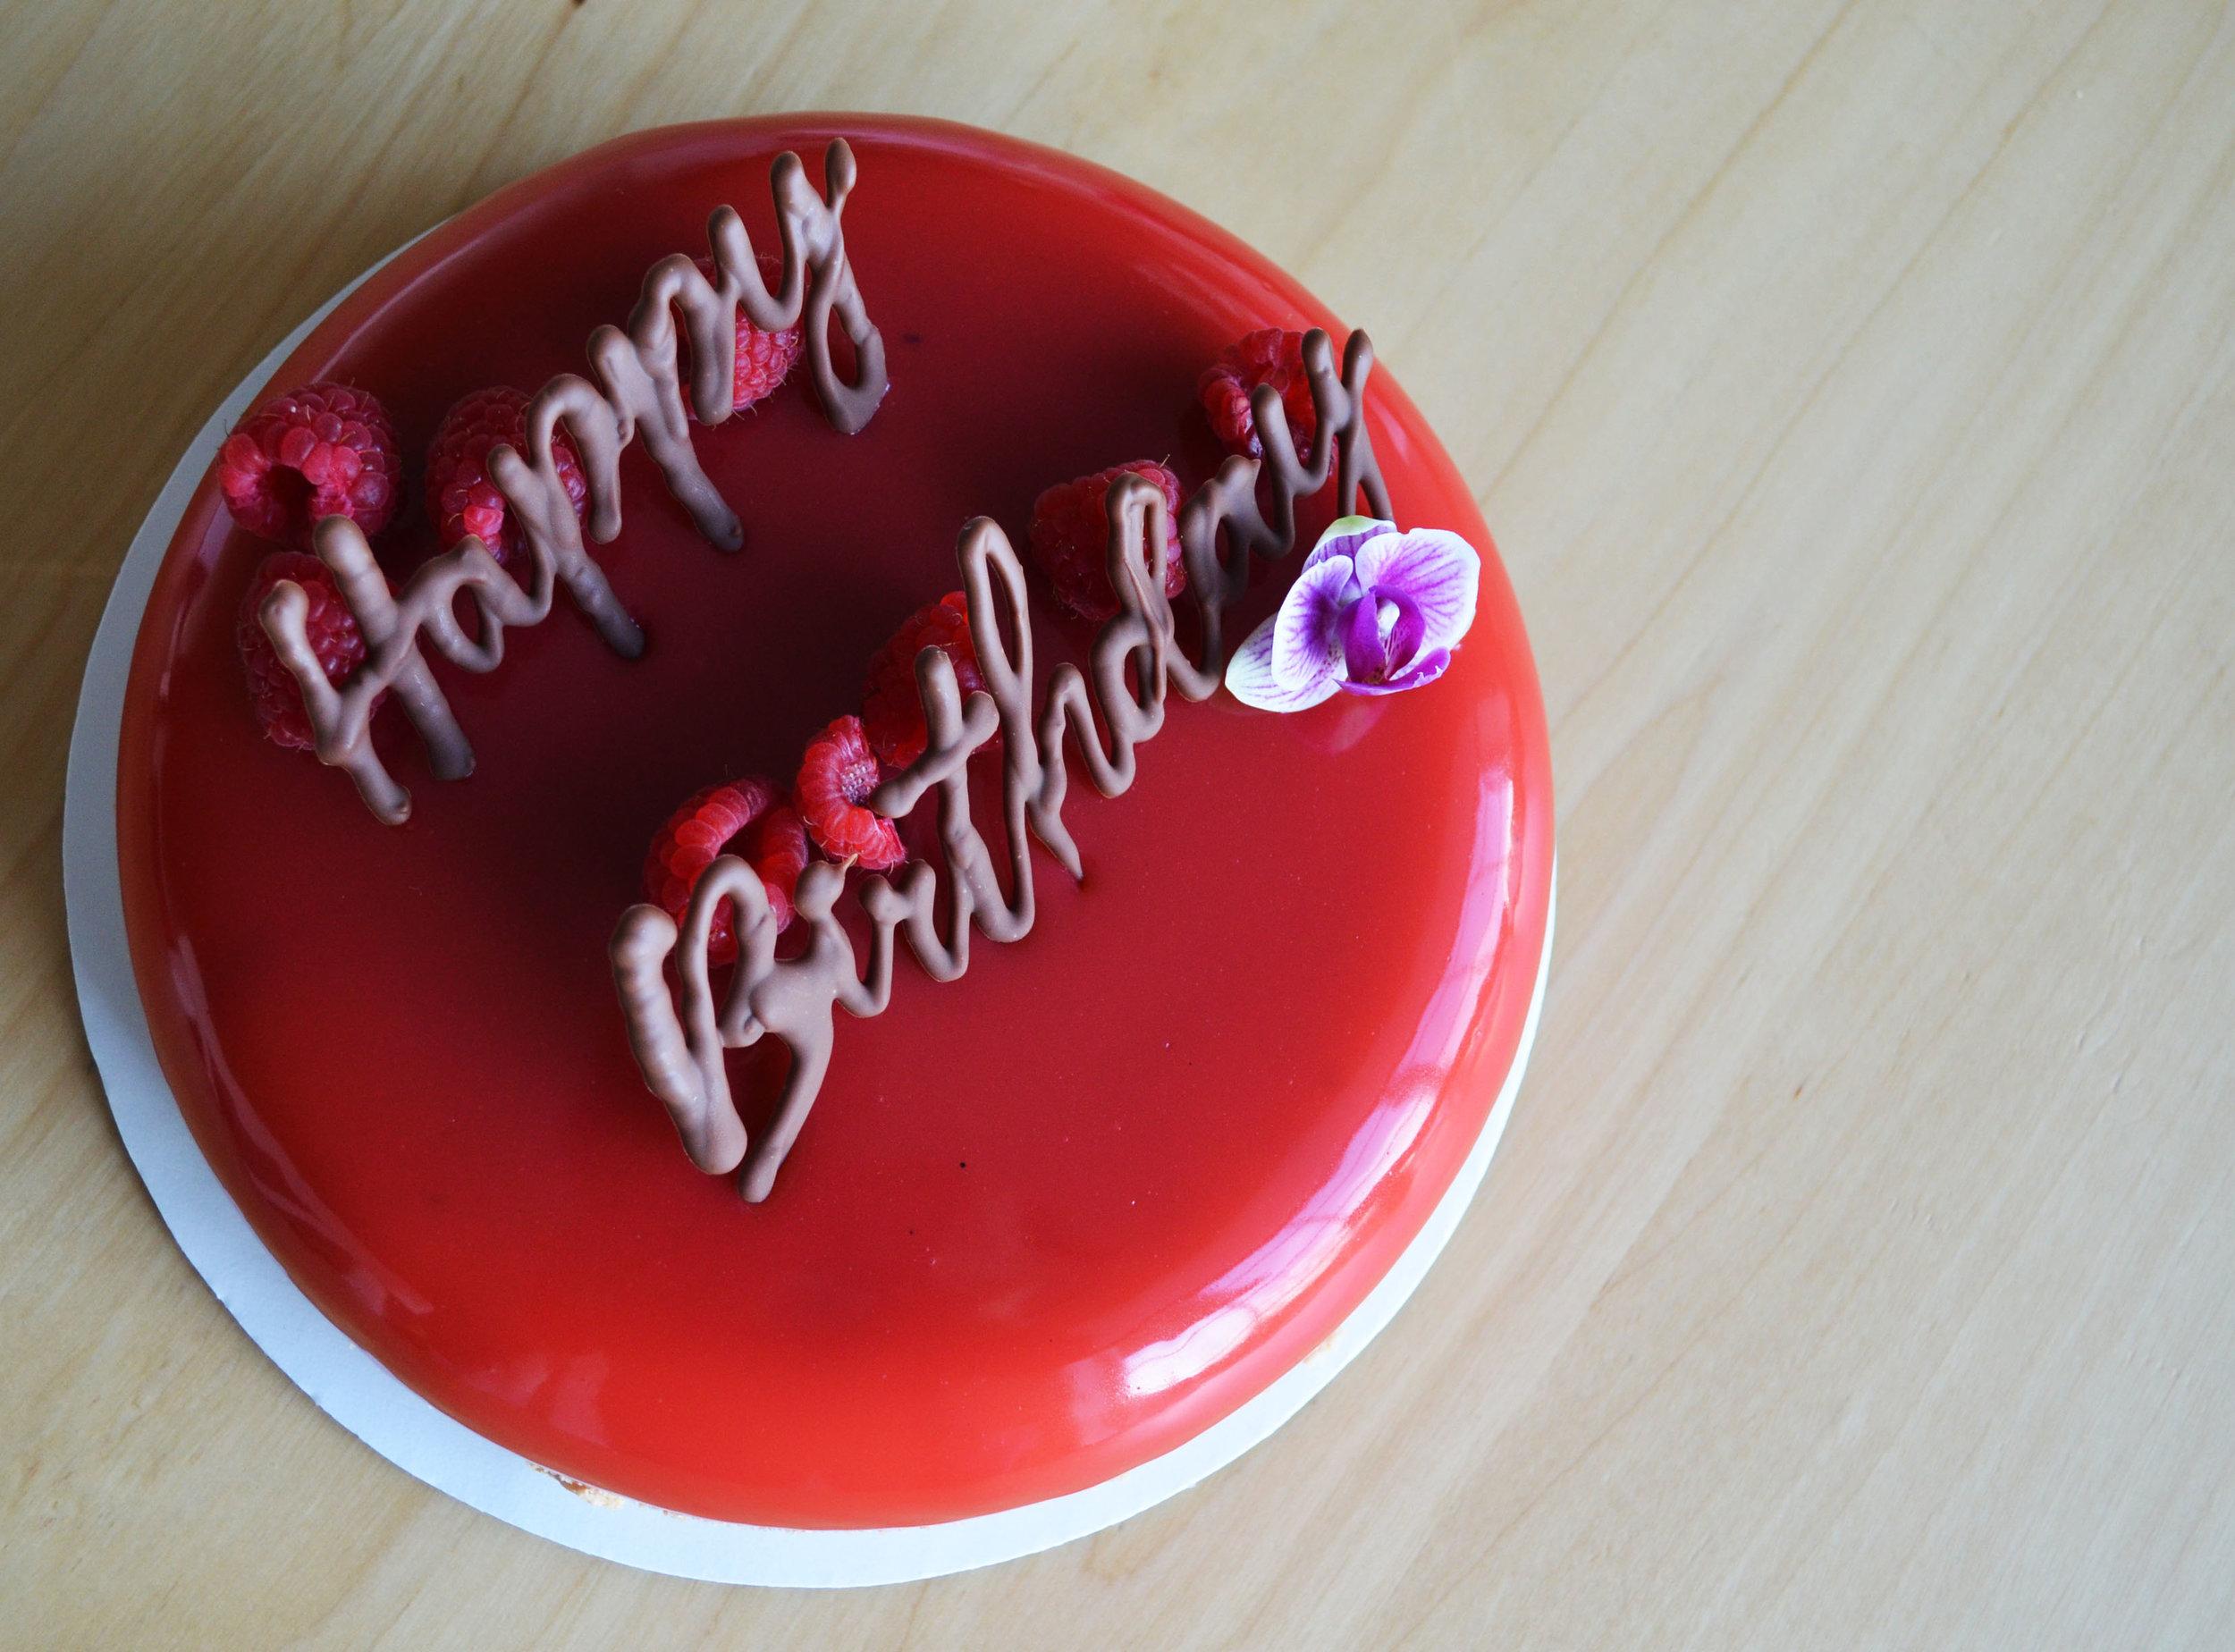 Mirror Cake / White Chocolate Mousse / Vanilla Sponge Crust